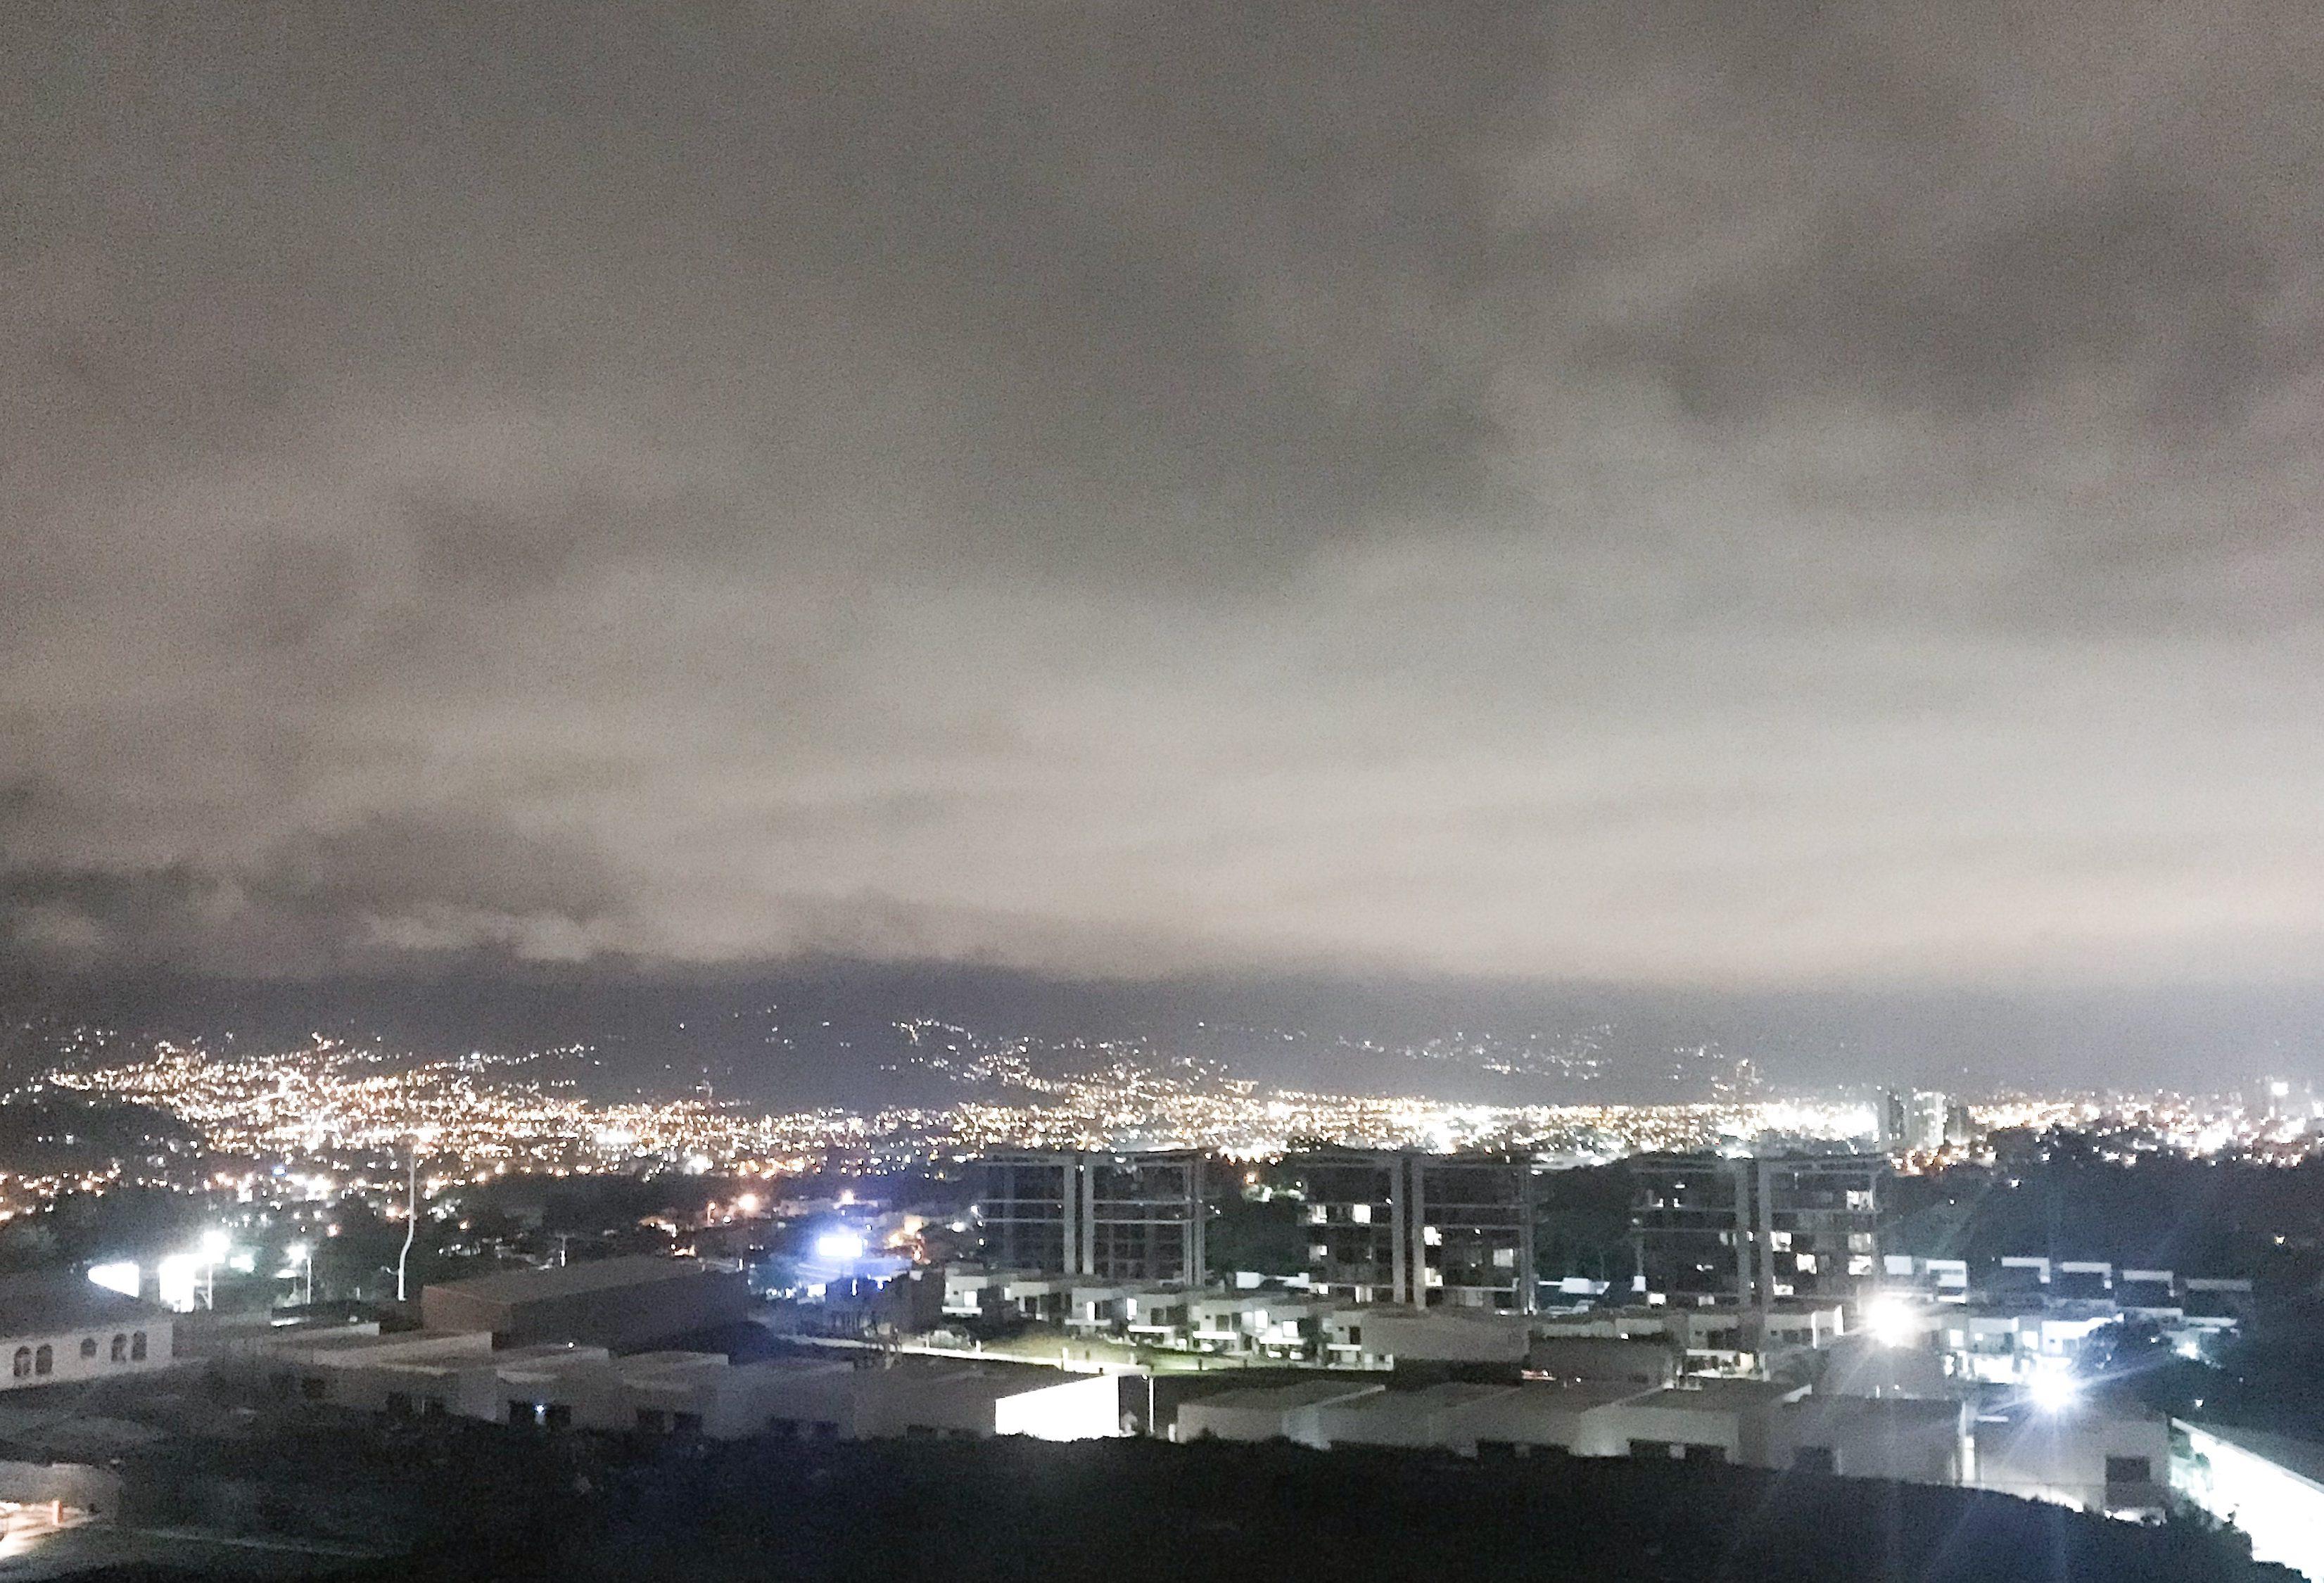 the lights of San Jose at night